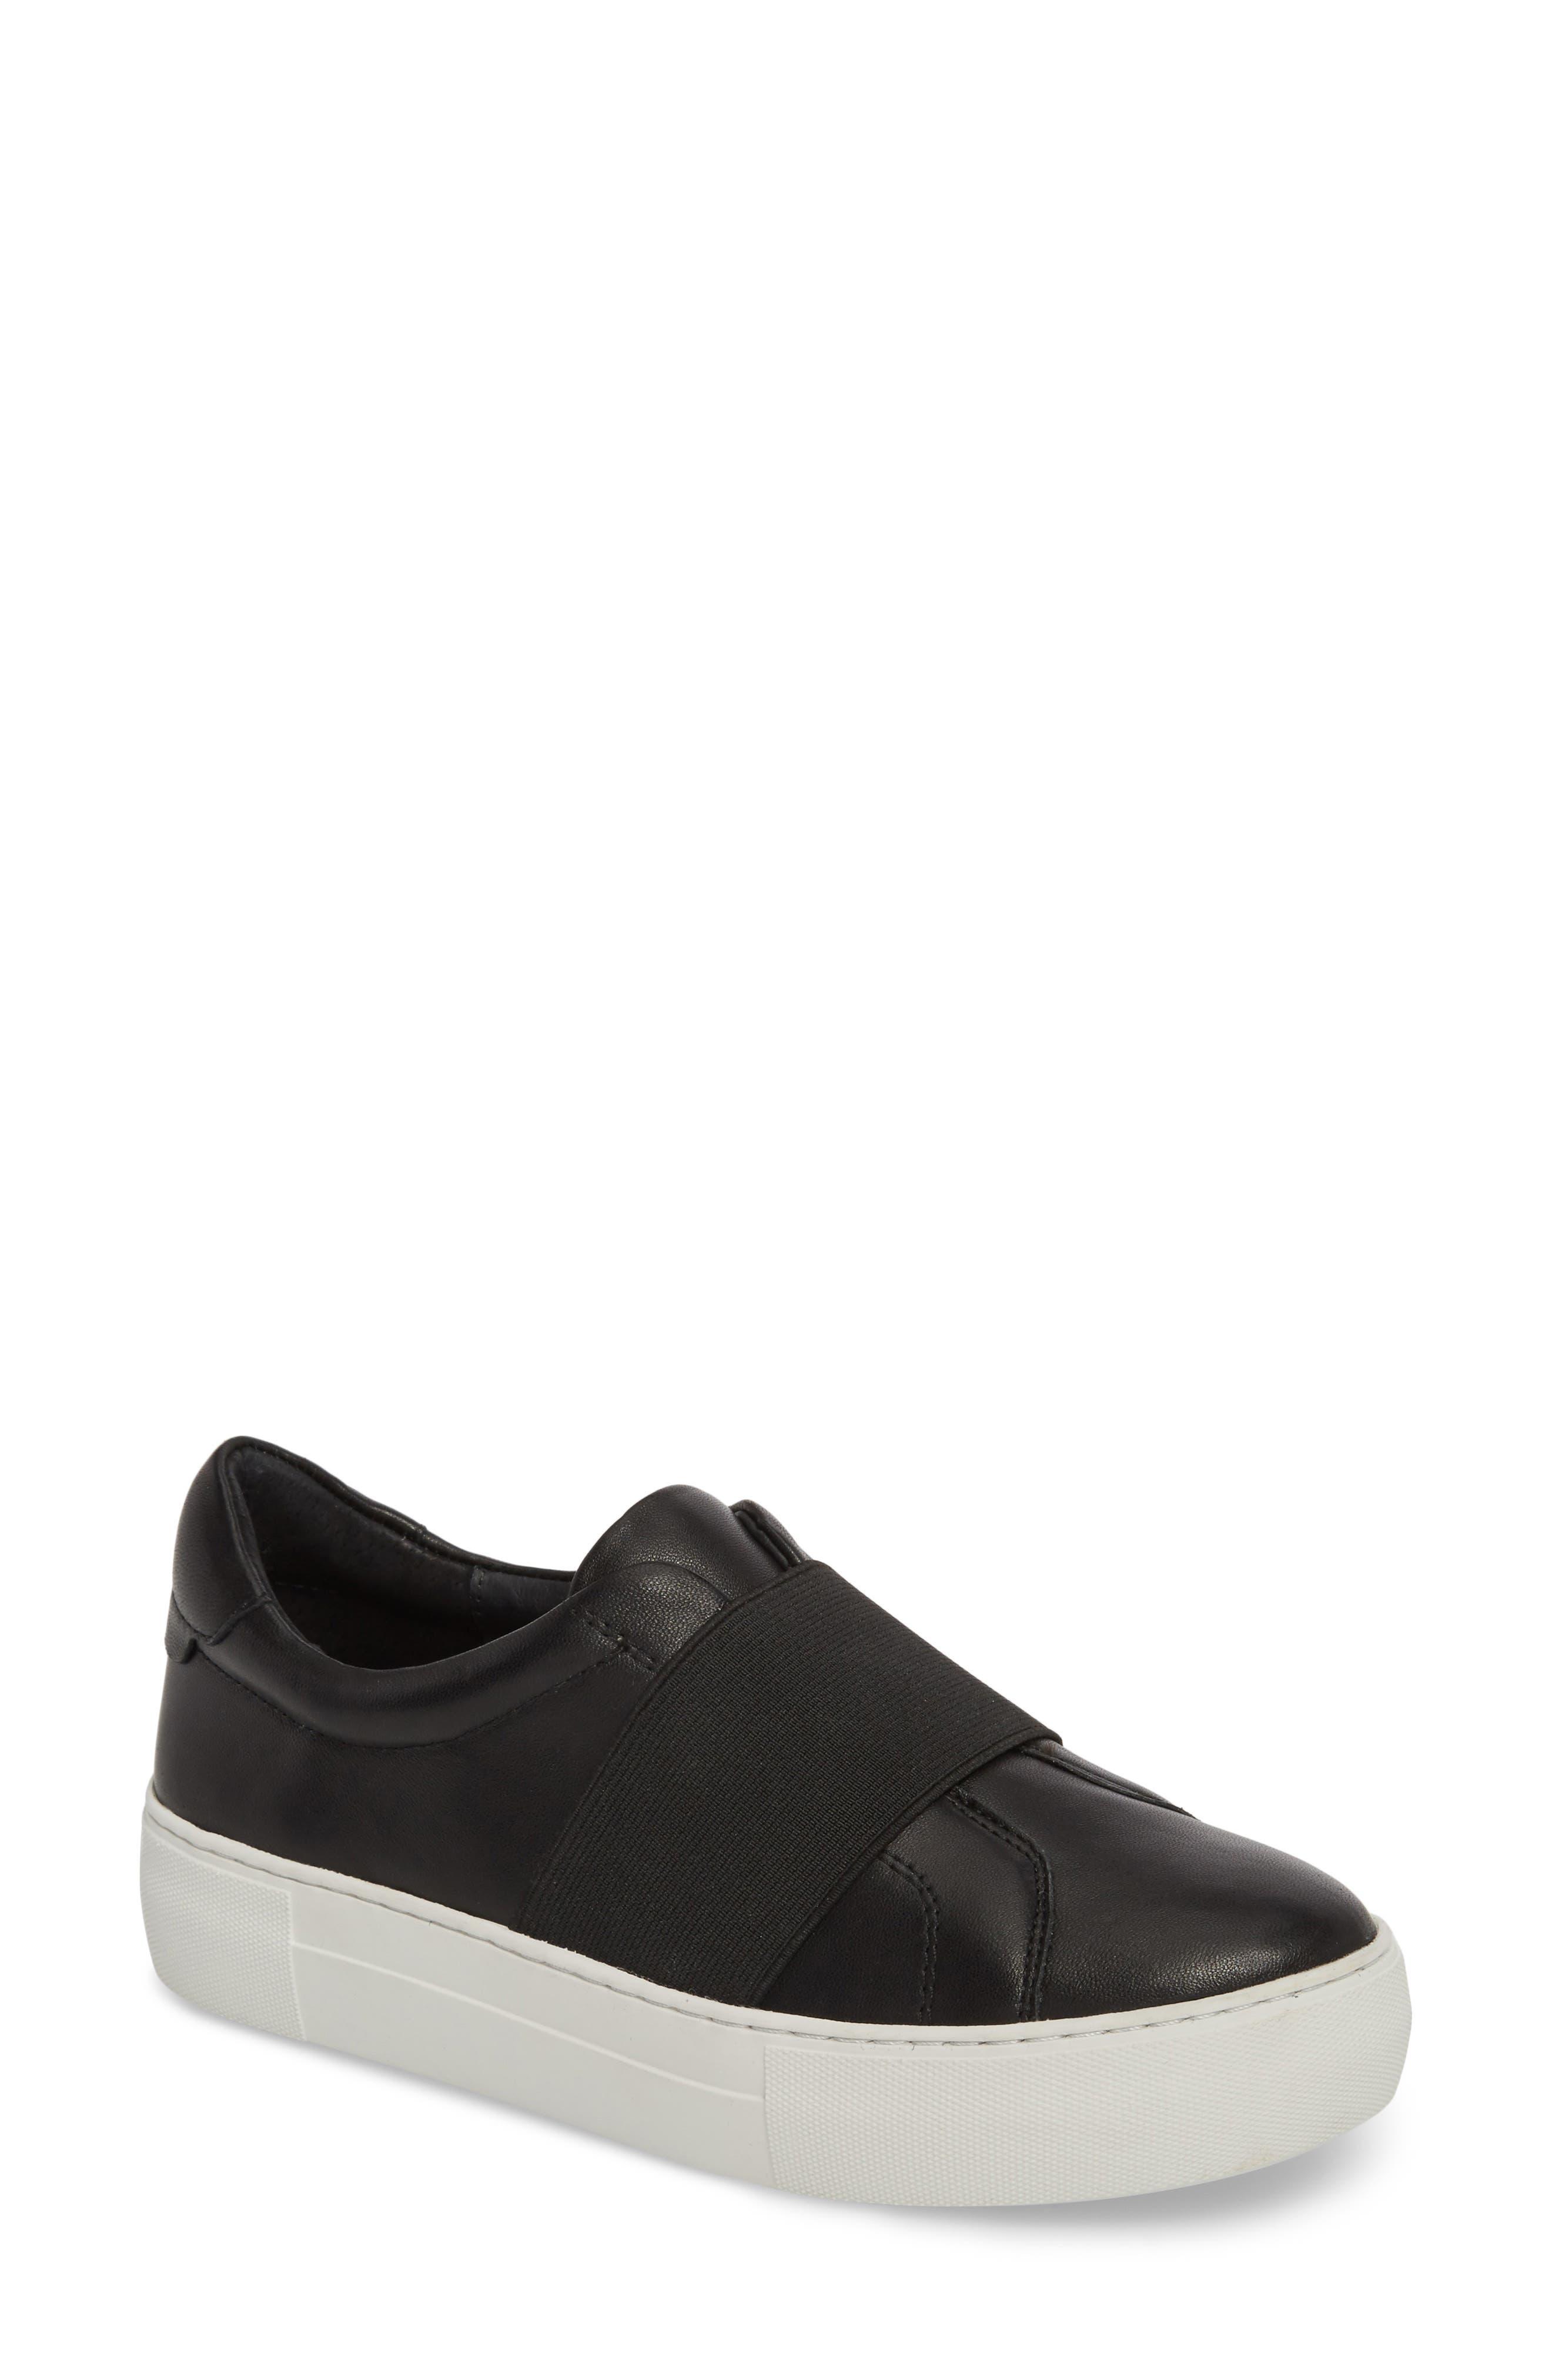 Adorn Slip-On Sneaker,                         Main,                         color, Black/ Black Leather